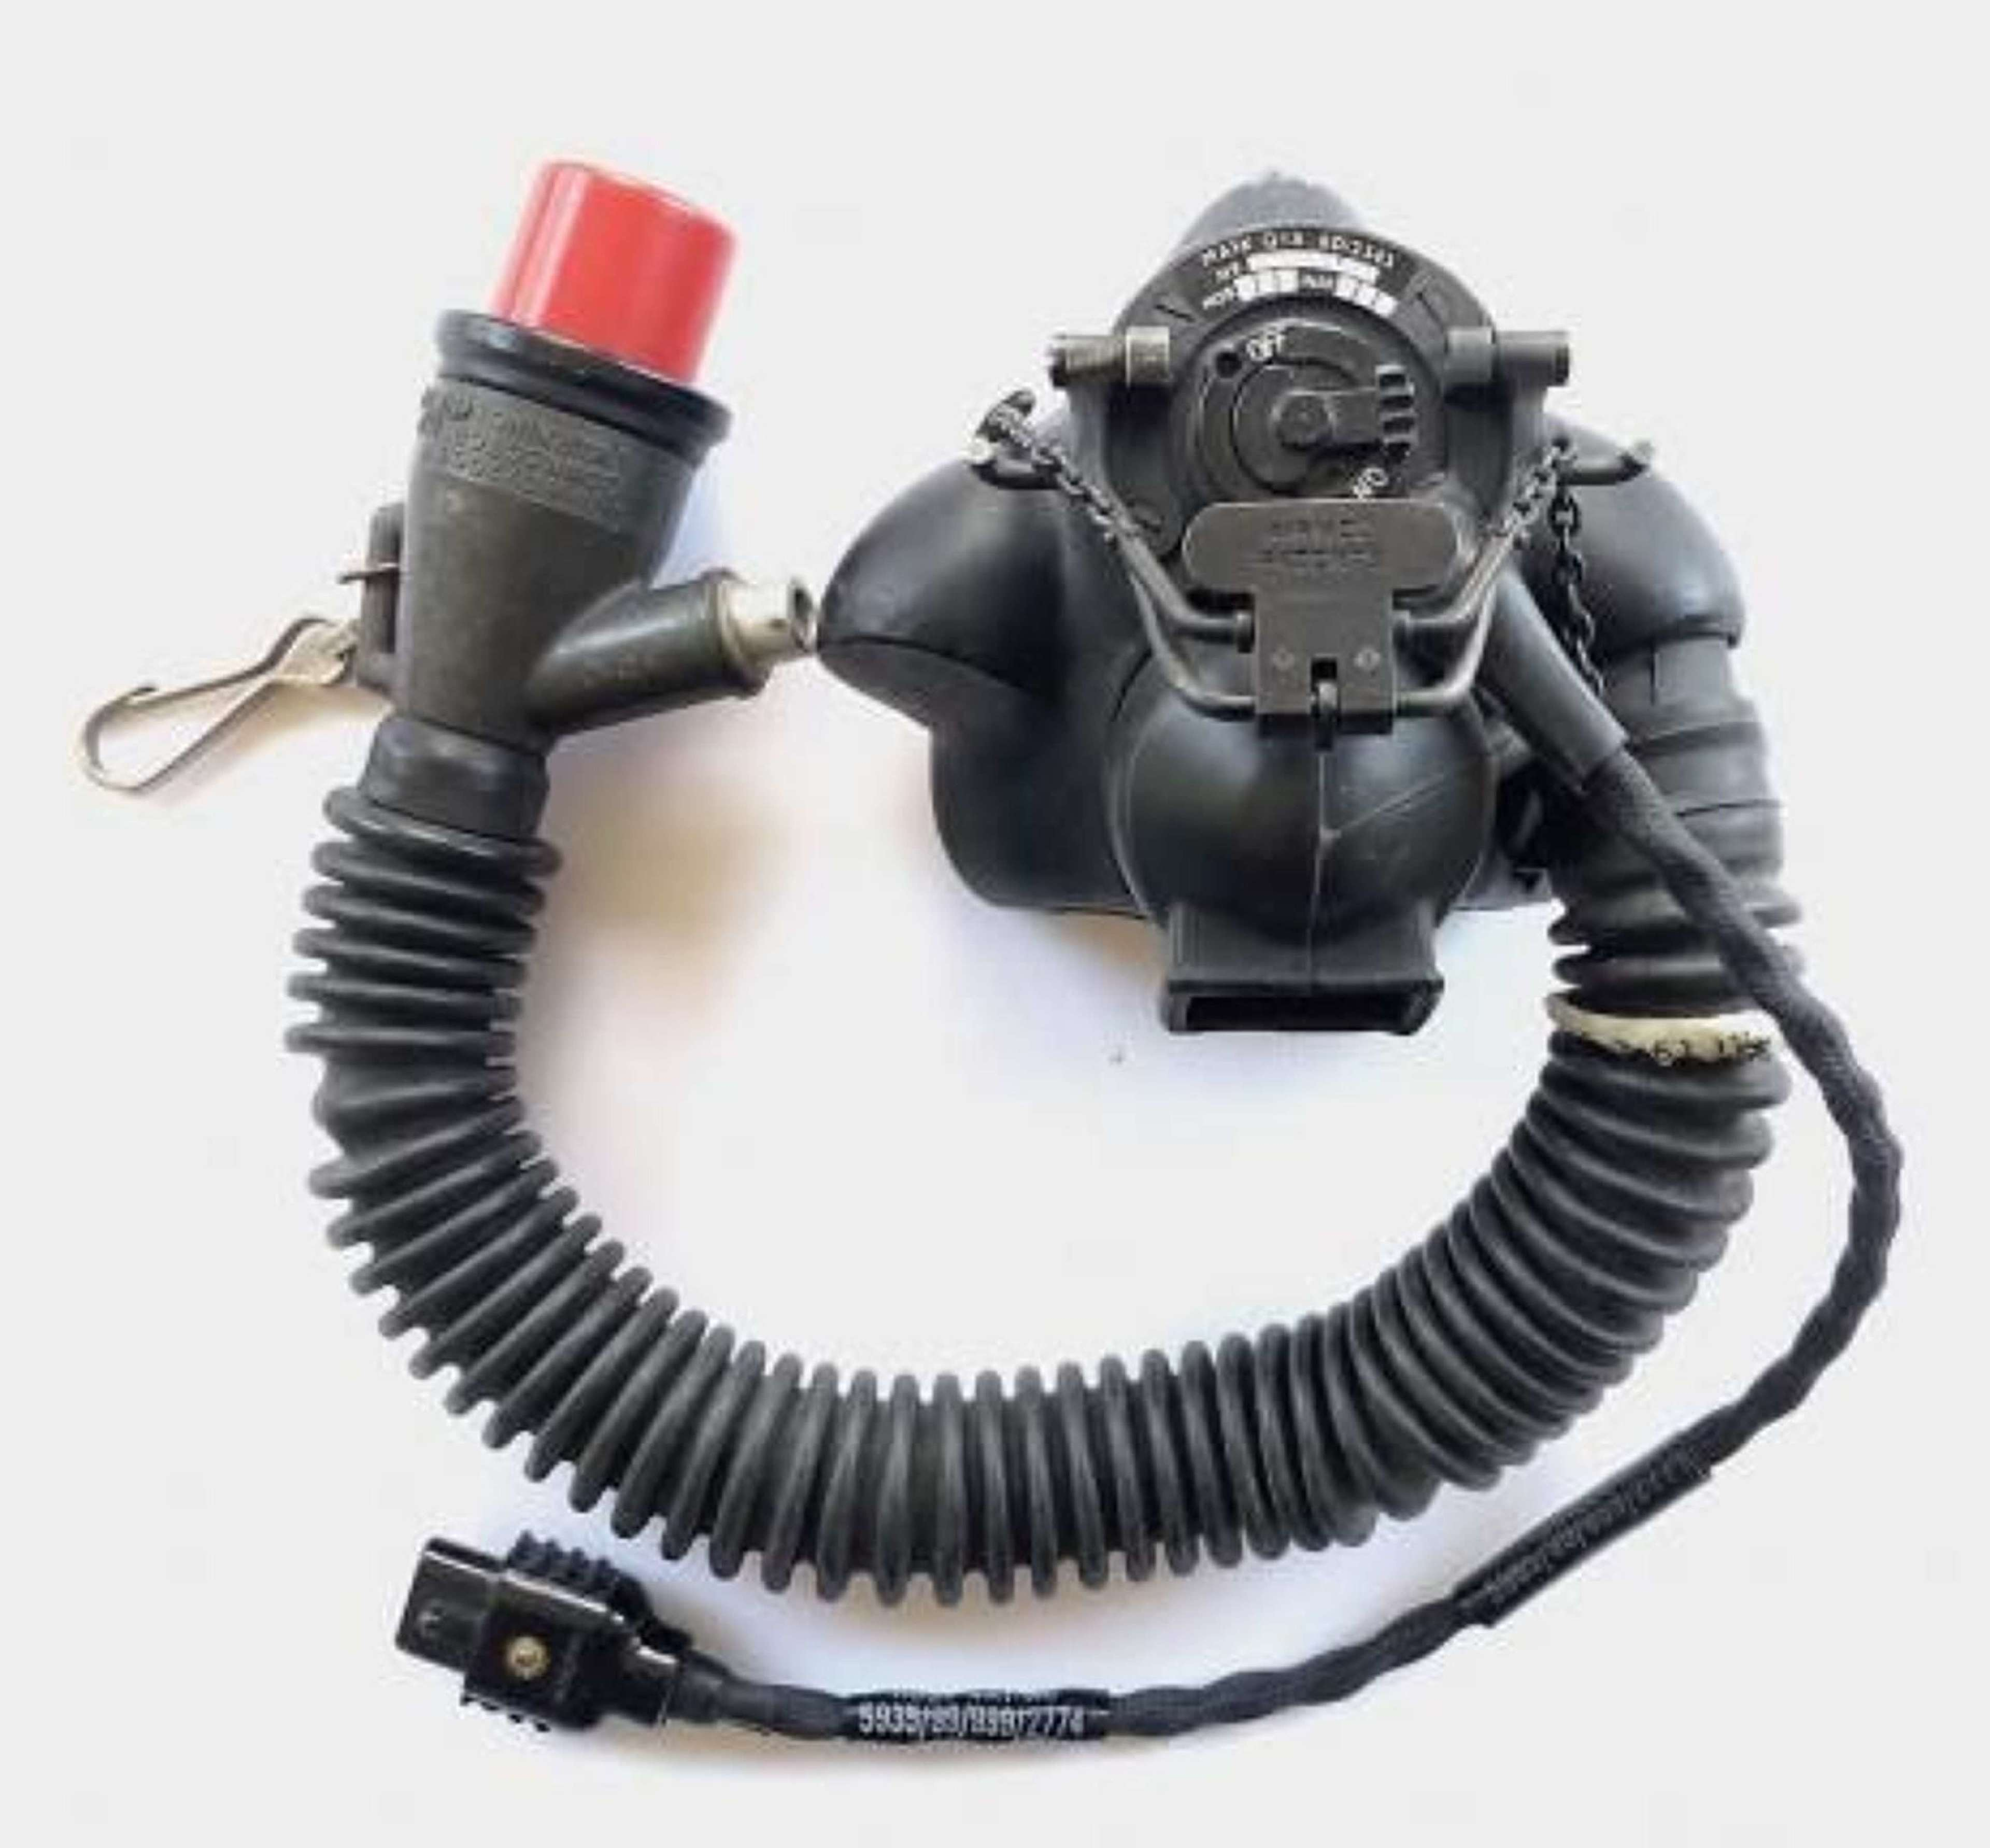 RAF Cold War Period P14 Oxygen Mask